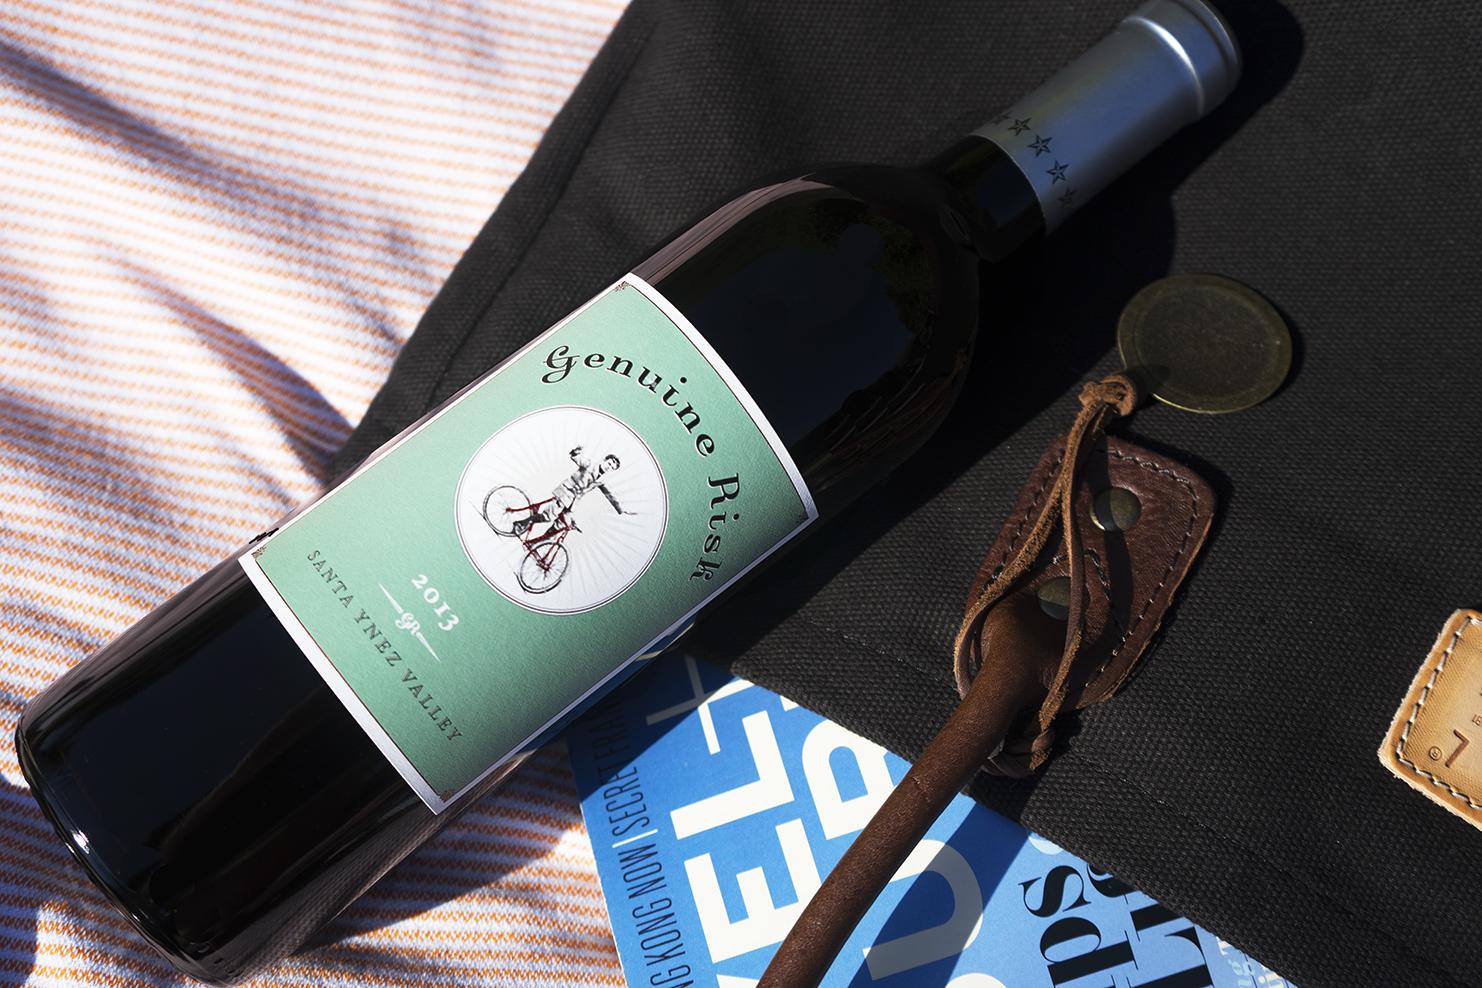 Genuine Risk Red Blend (76%Cabernet Sauvignon, 13% Petit Verdot, 7% Cabernet Franc,4% Merlot), 2013, $22.99